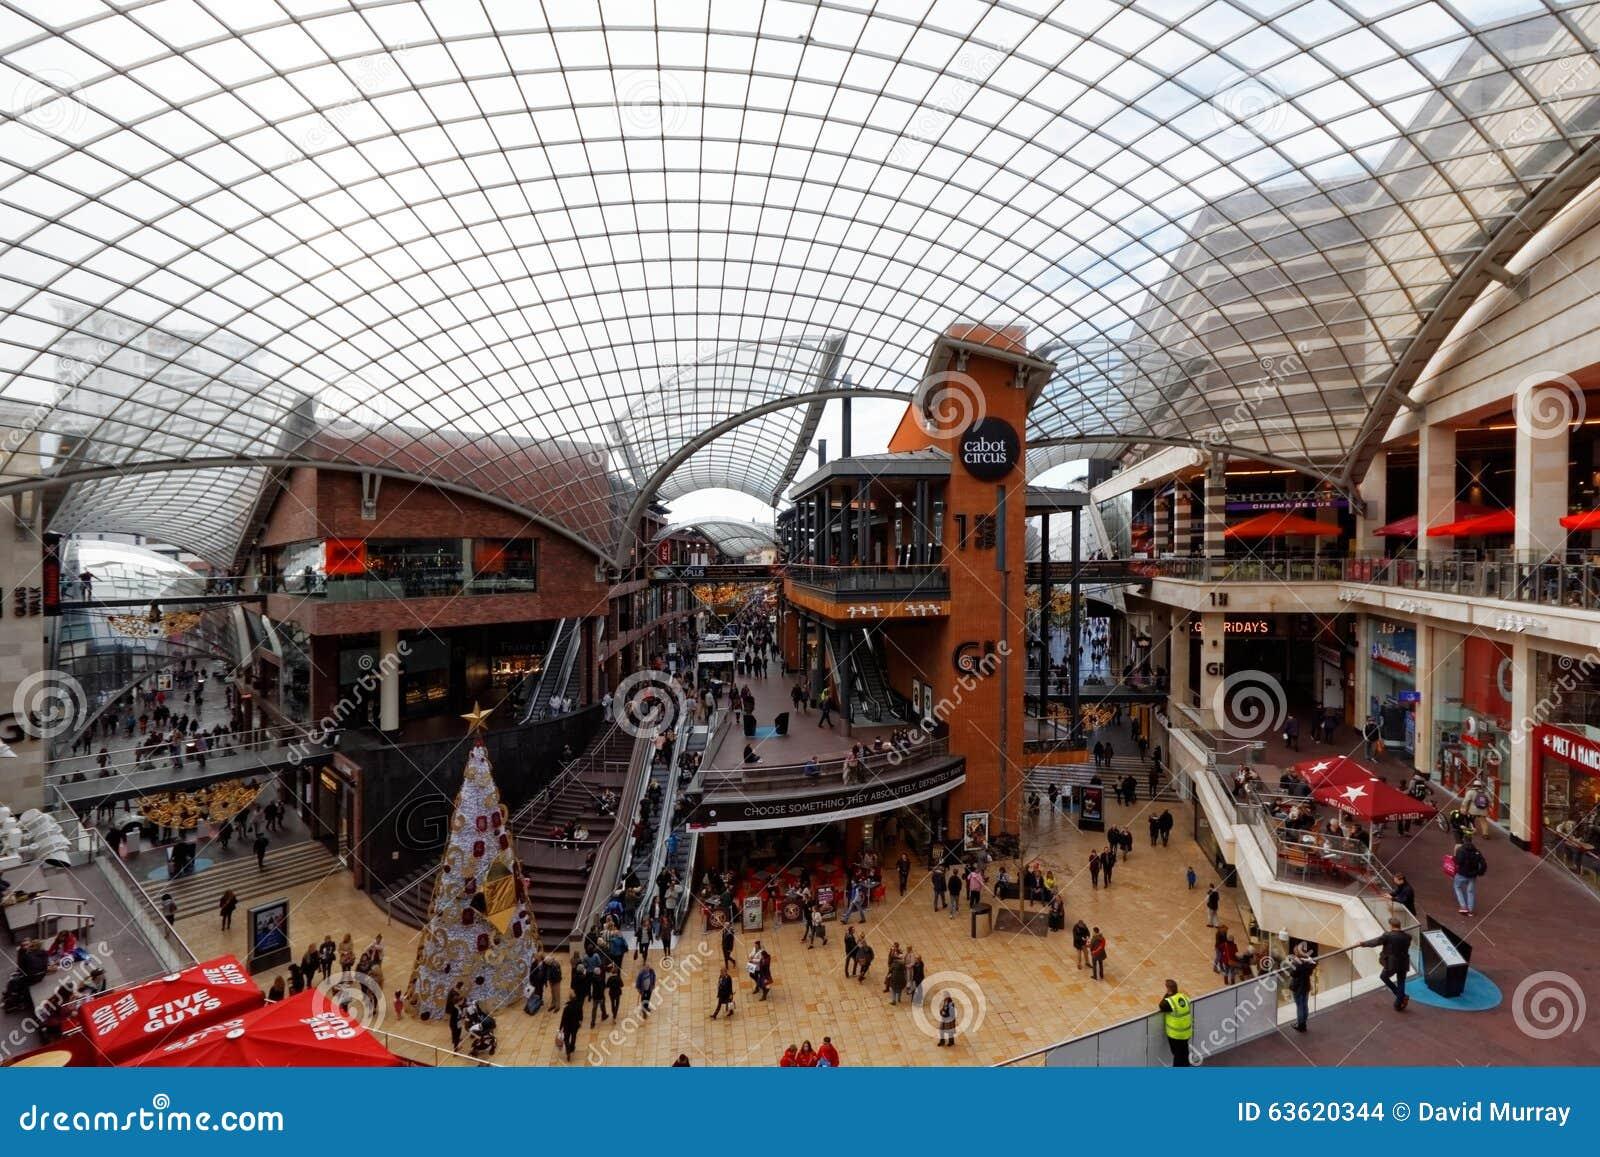 b90821c3a2dc3 Editorial Photograph of Cabot Circus Shopping Centre. Close to the City  Centre